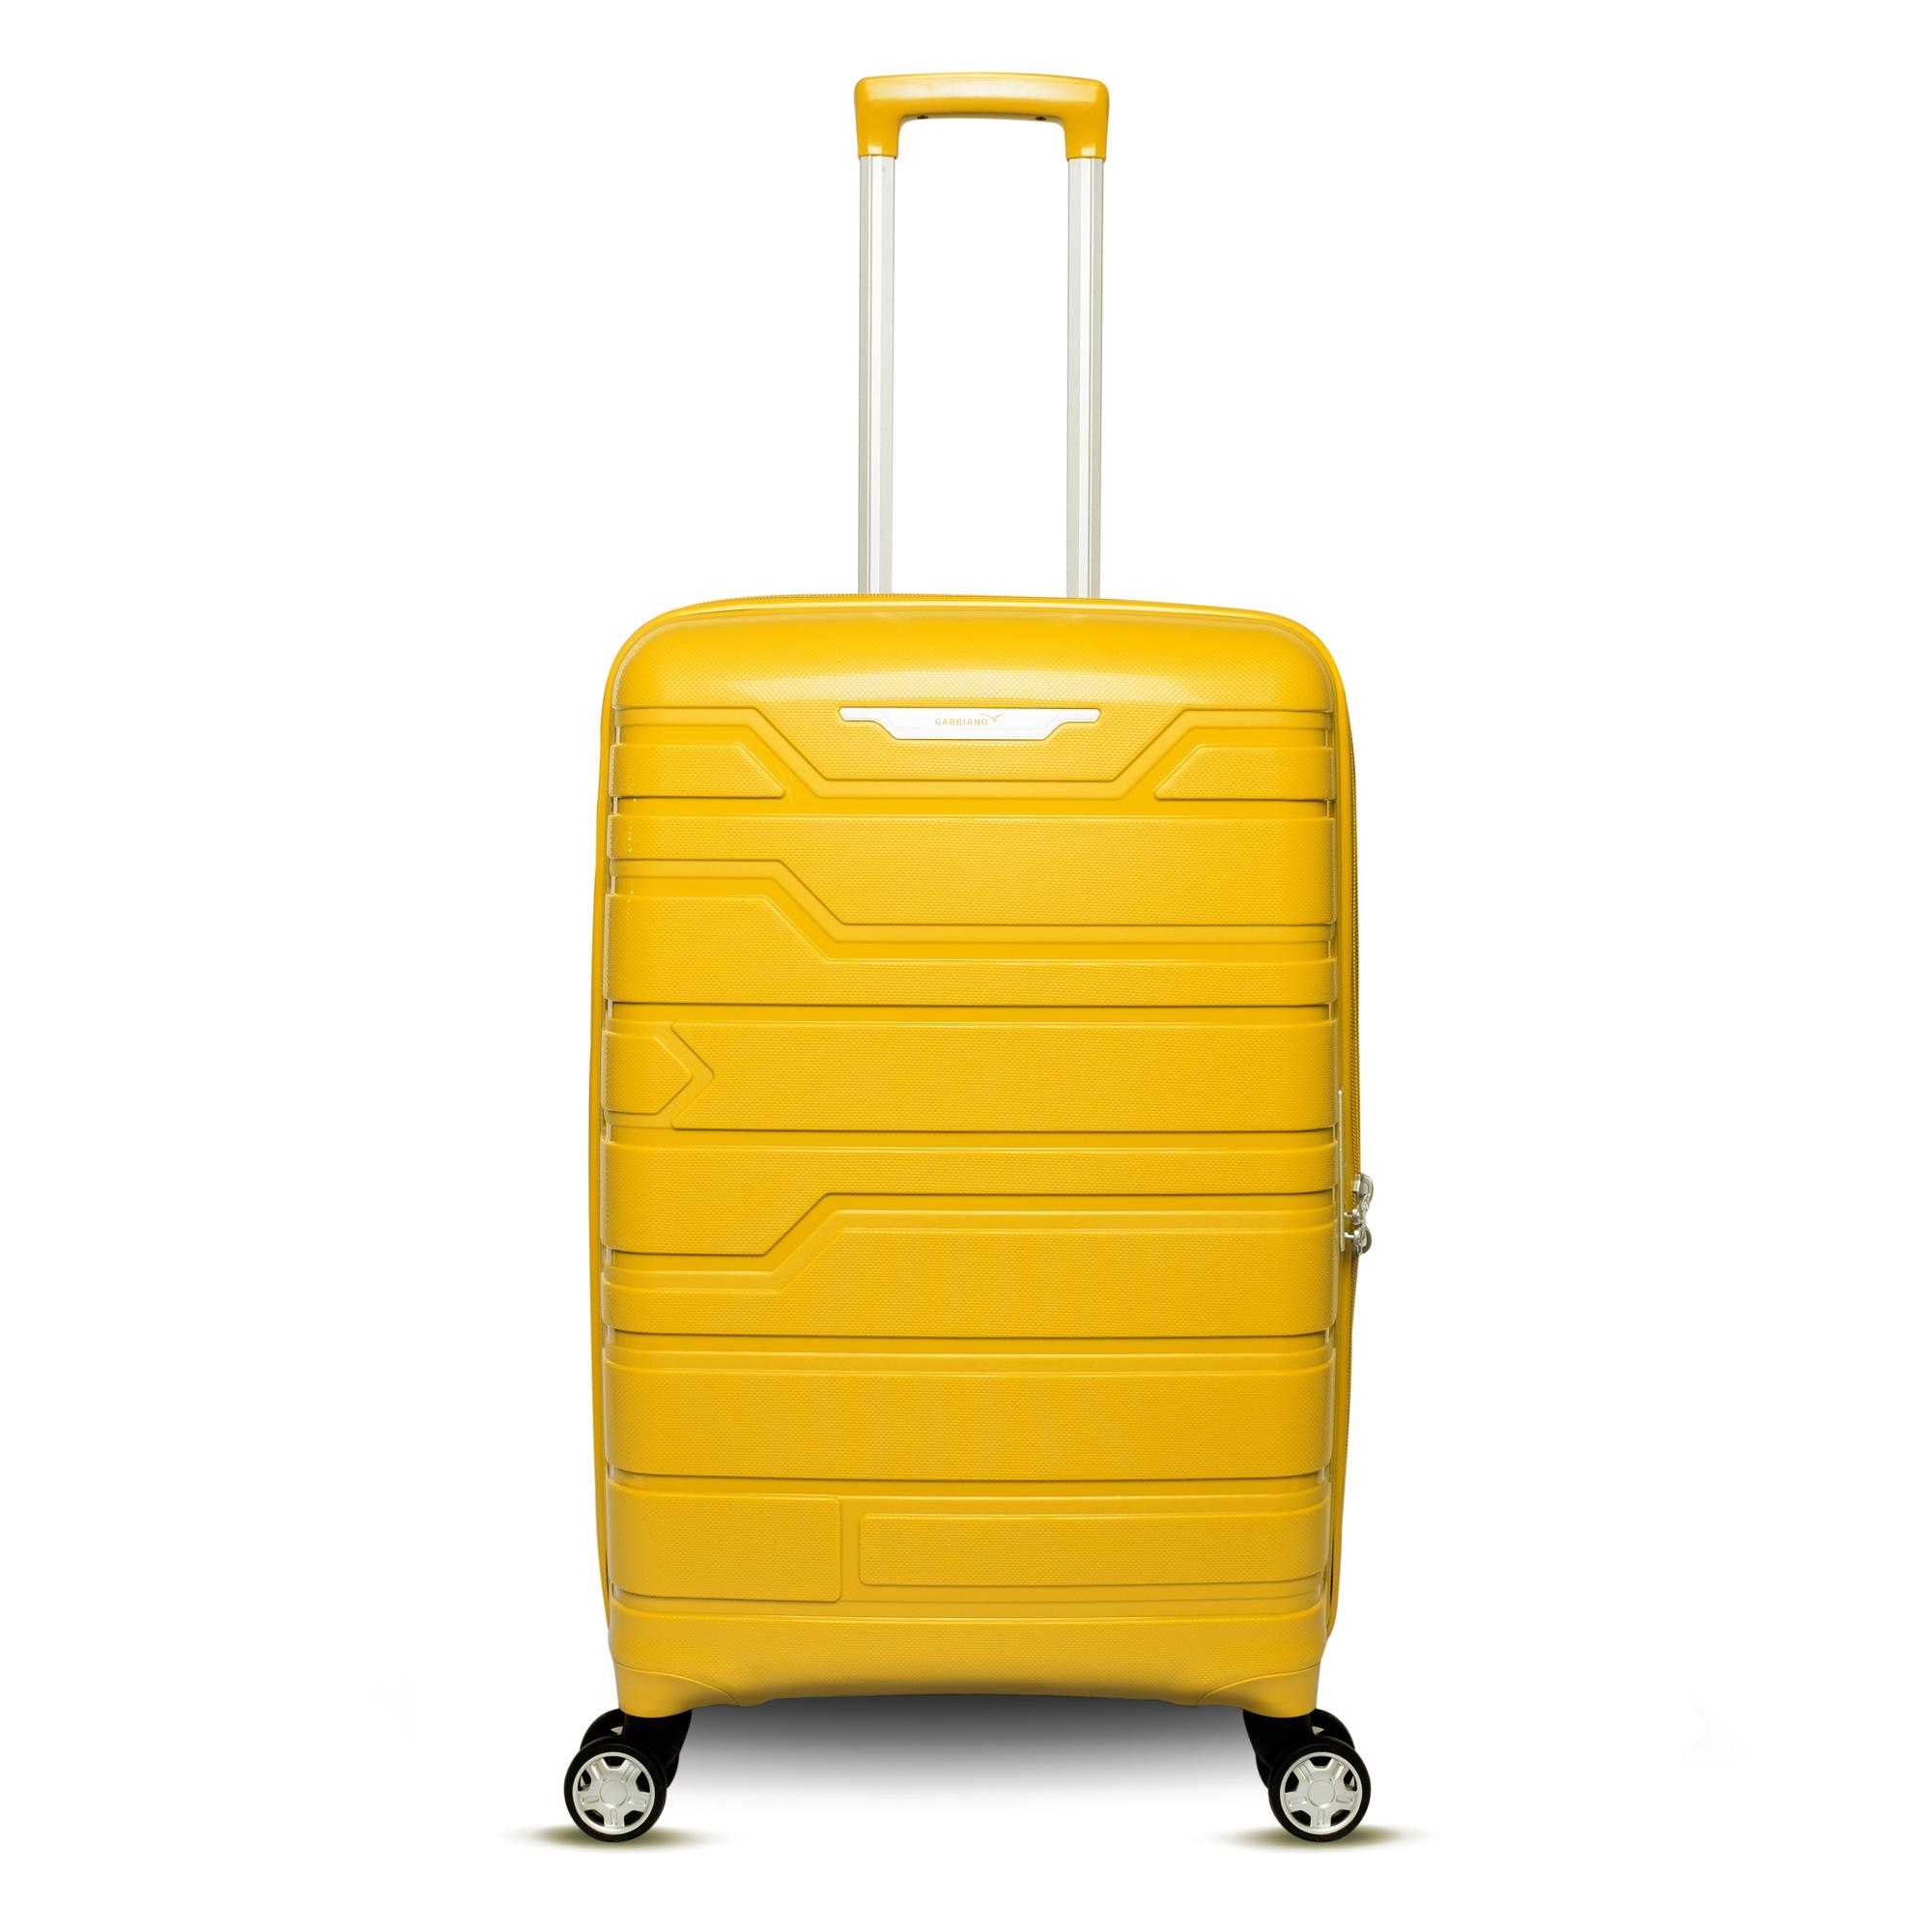 GA1140-front-yellow-2k